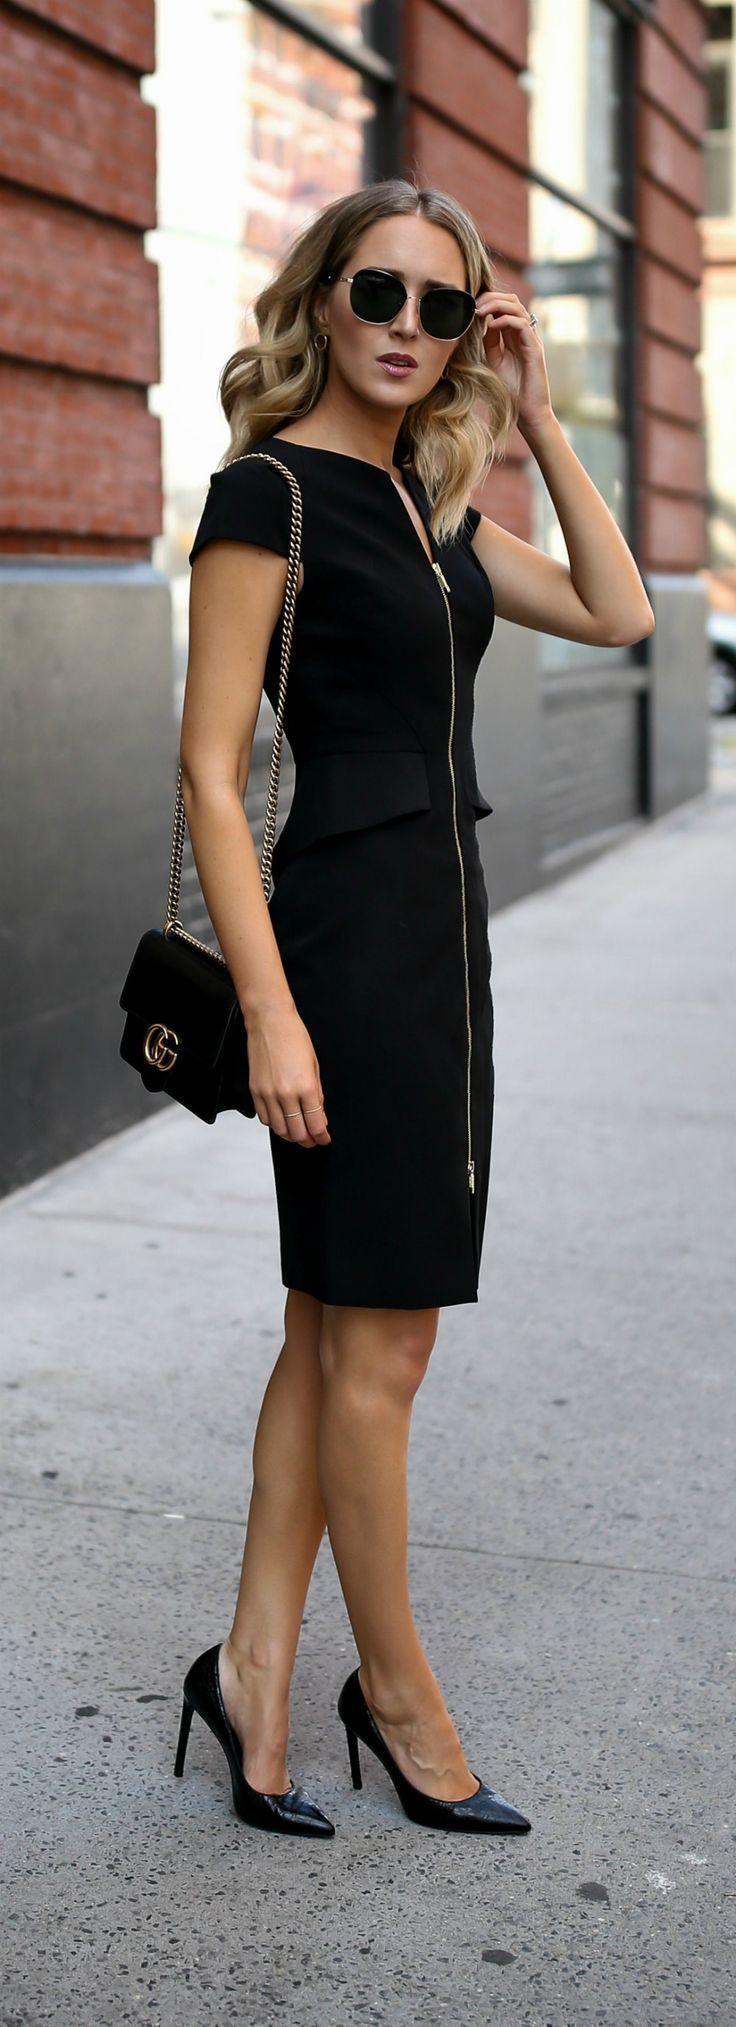 Classic Black Sheath Black Peplum Front Zip Sheath Dress Classic Black Pumps Oversized Sunglasses Ted Baker Nordstro Work Fashion Fashion Trendy Dresses [ 2027 x 736 Pixel ]